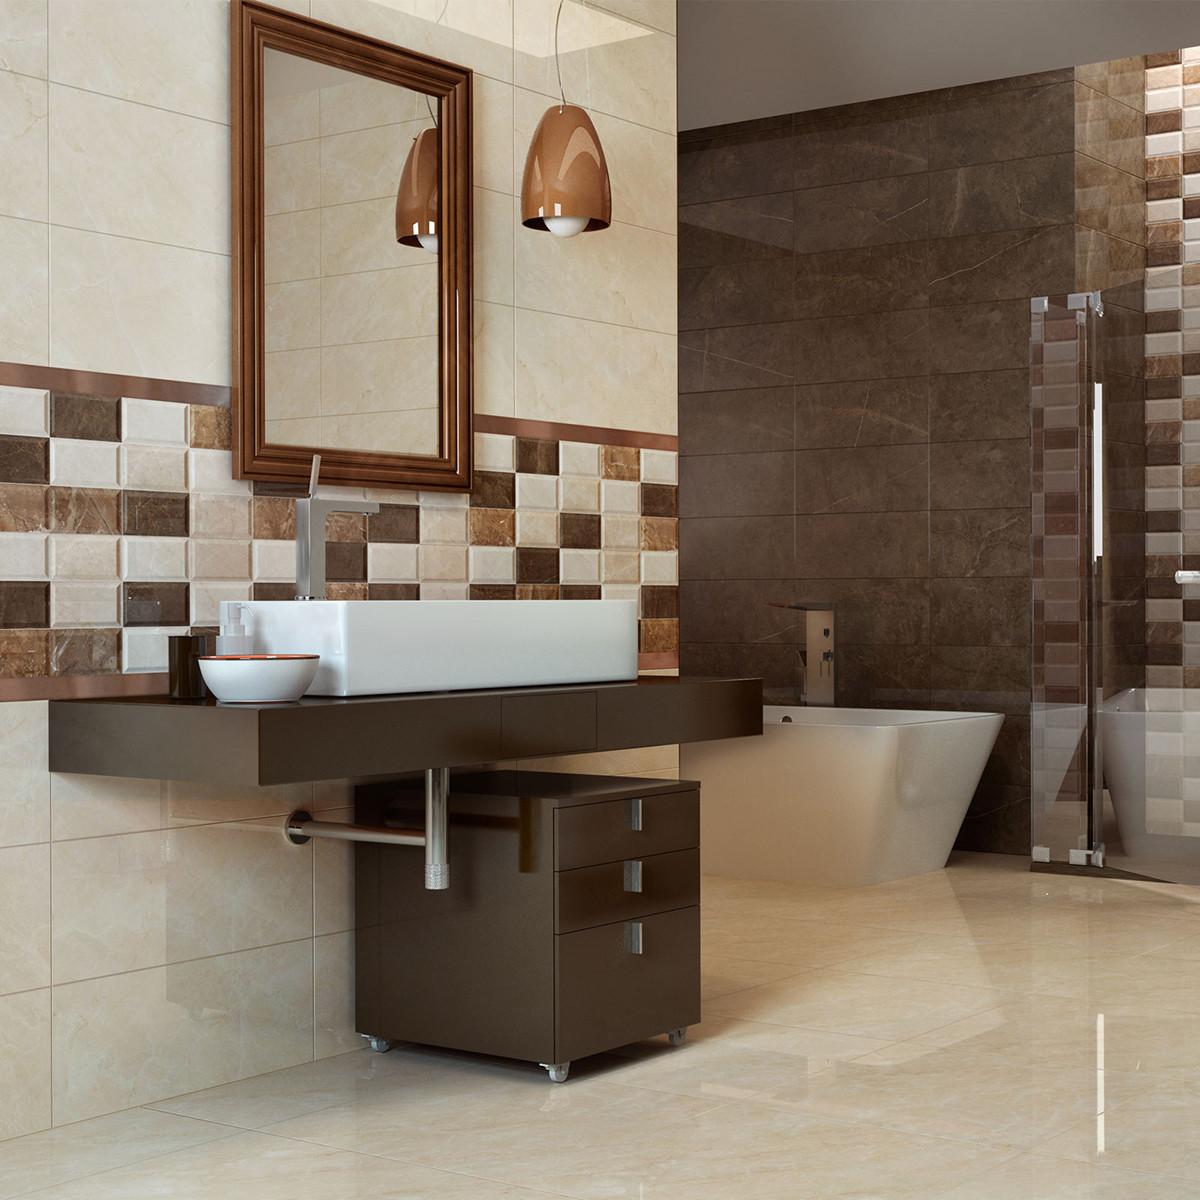 Crystal cream floor tile crystal cream wallfloor tile doublecrazyfo Image collections